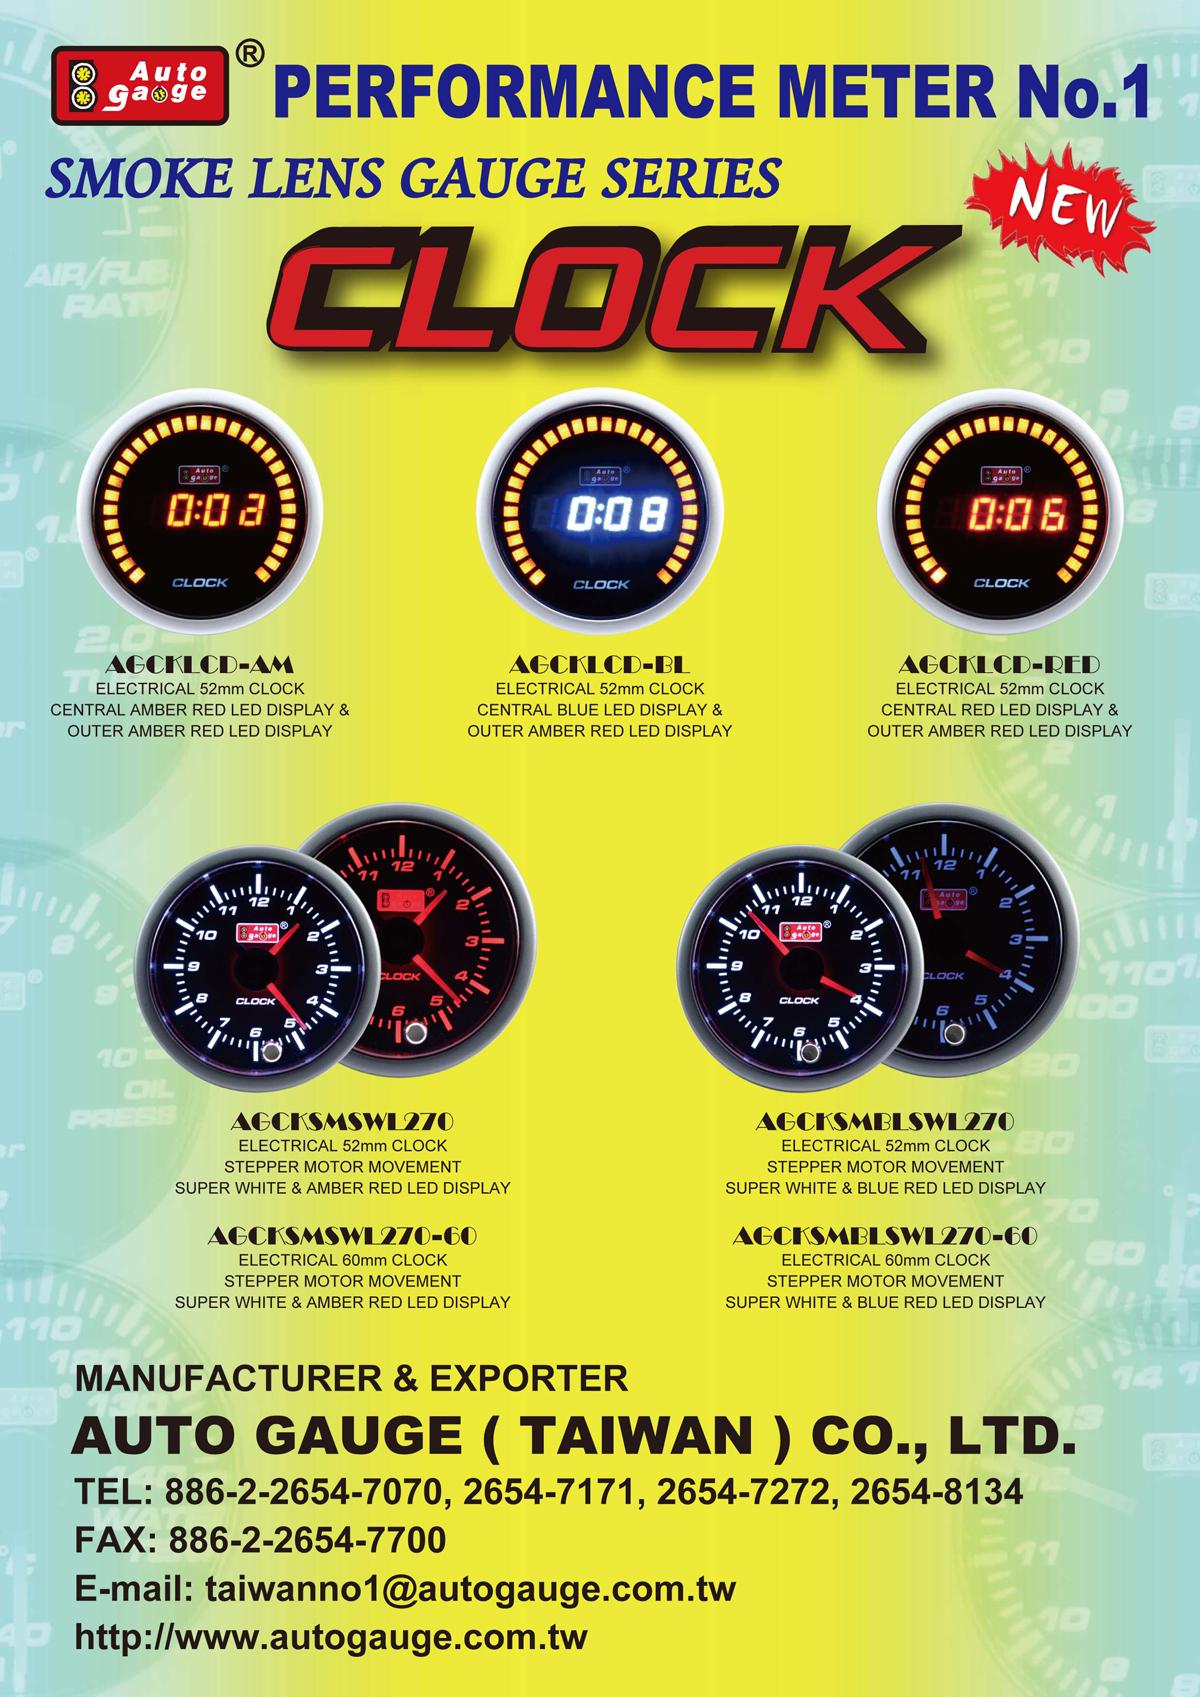 http://gb.cri.cn/mmsource/images/2009/07/21/9/5526980682537486733.jpg_source 52 mm electrical 12v led digital car clock